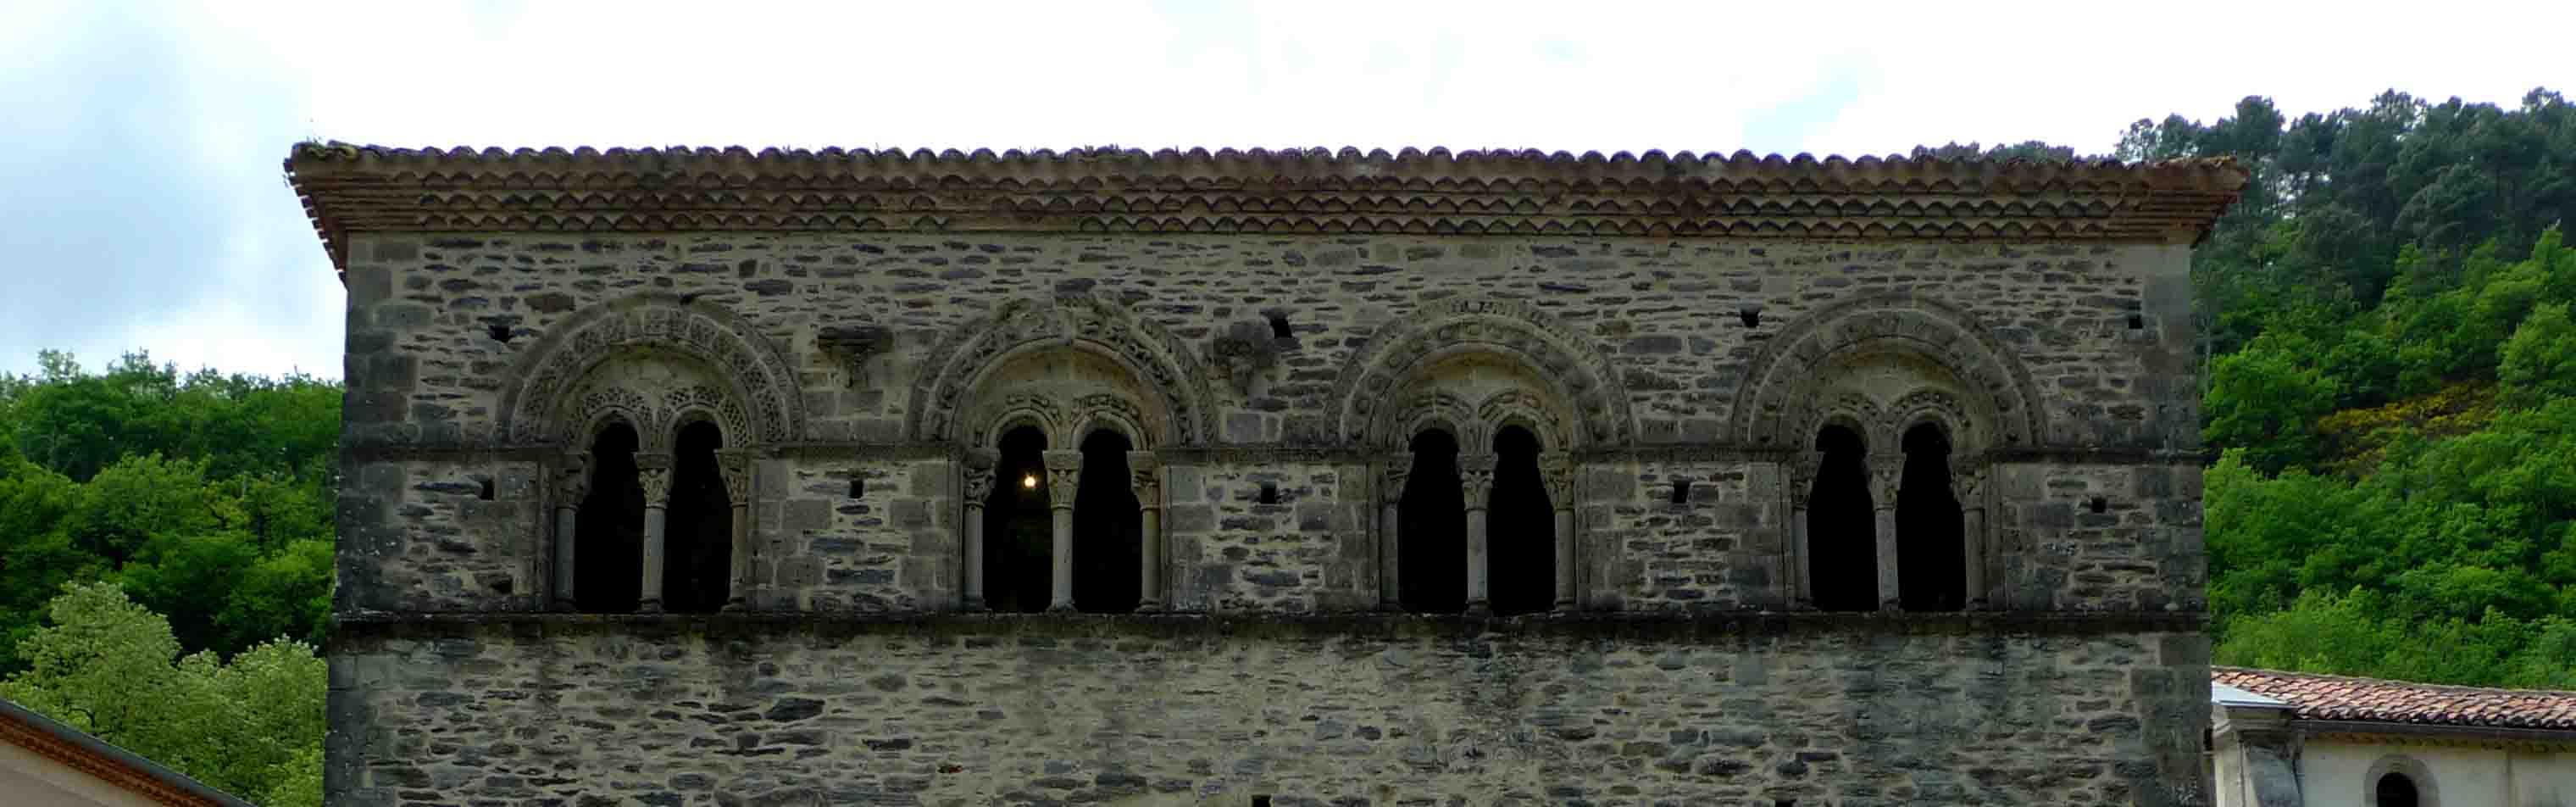 Pavillon Adelaide. 3